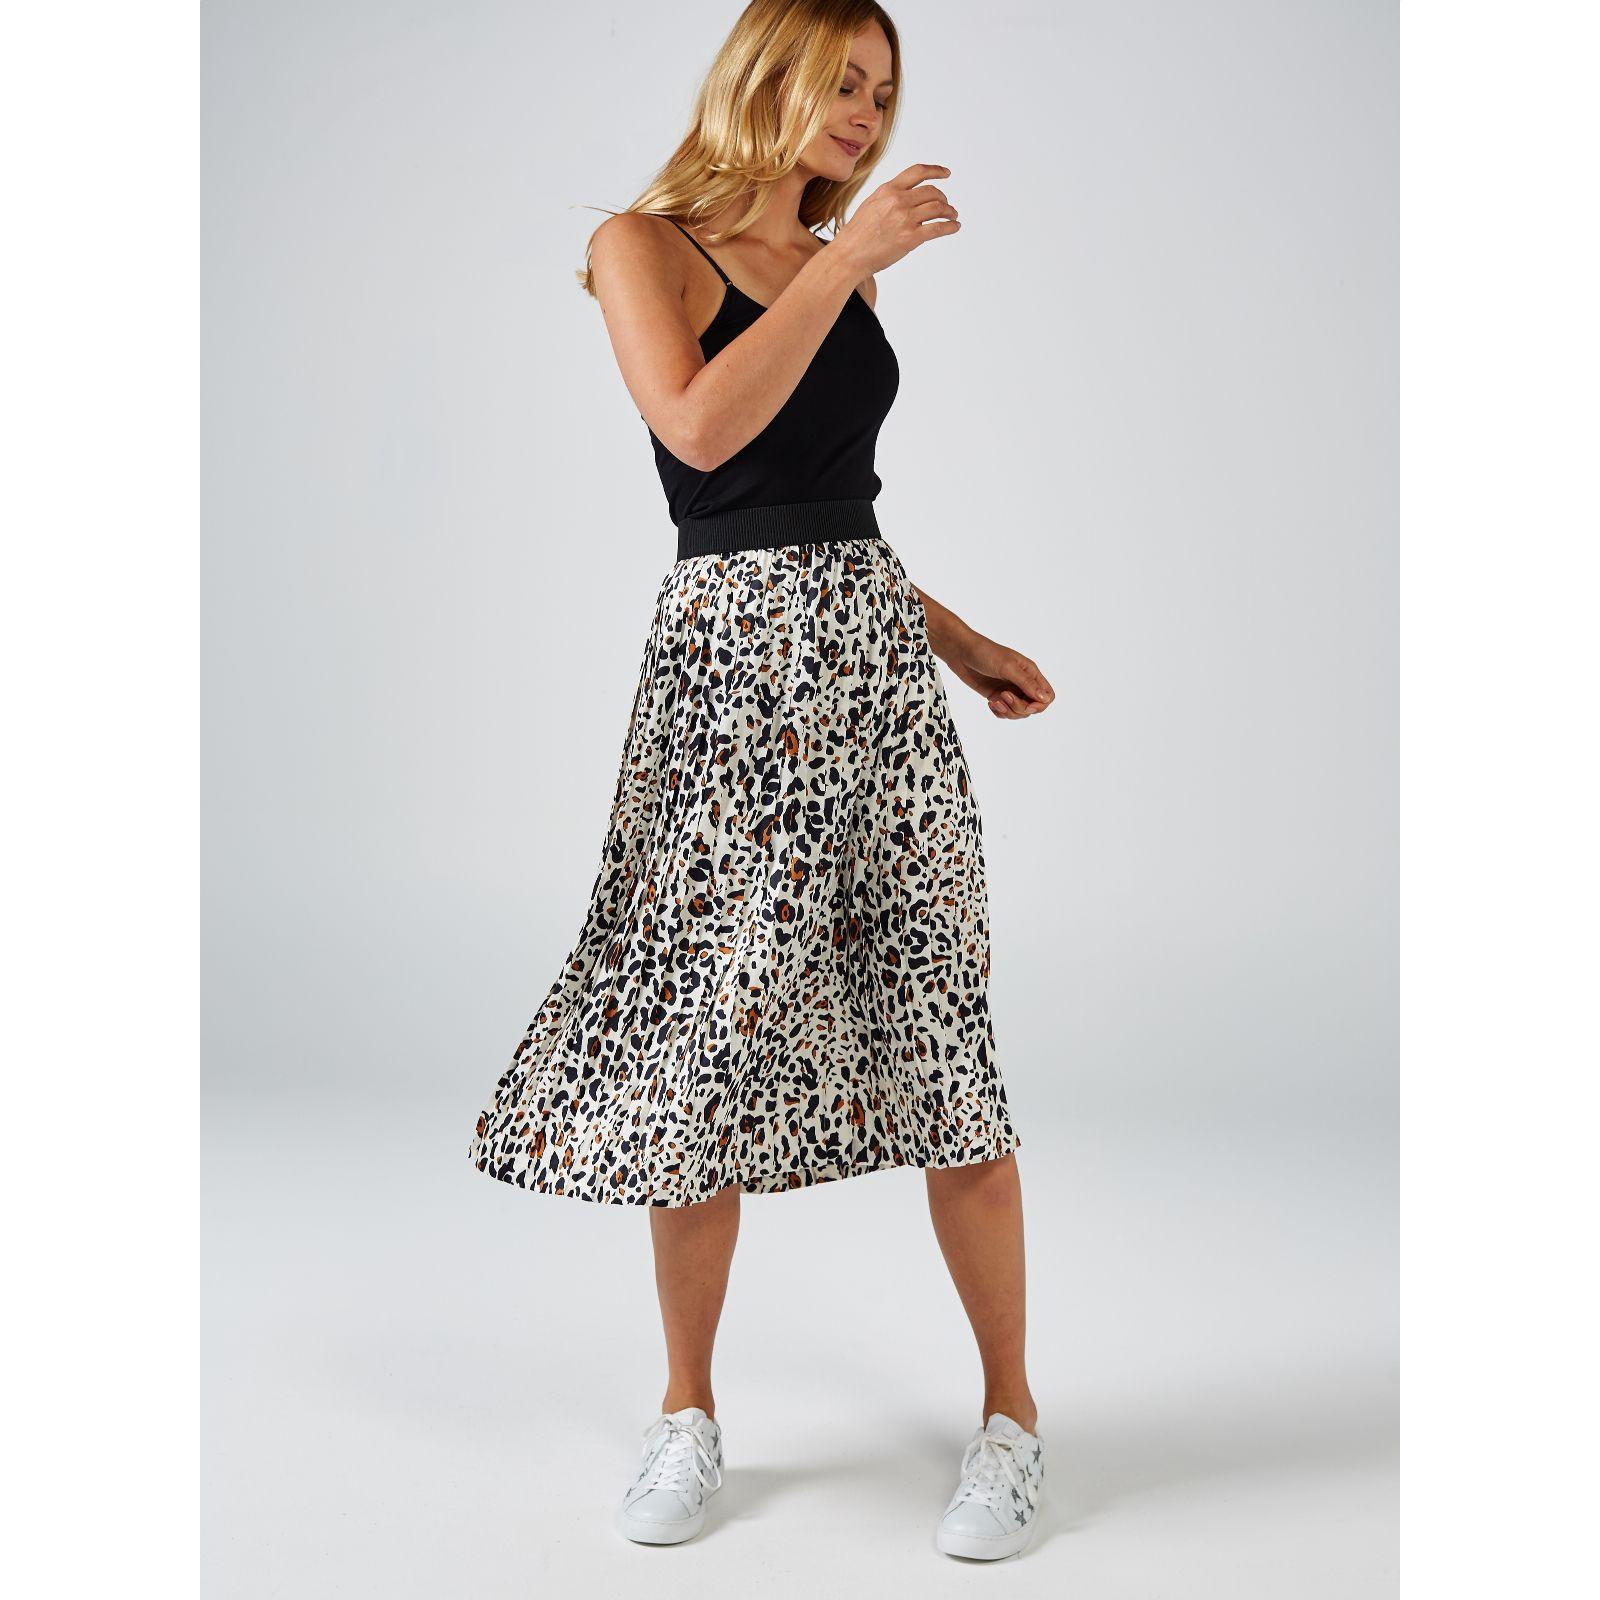 e06a71d9d5 Helene Berman Animal Print Pleated Midi Skirt - QVC UK